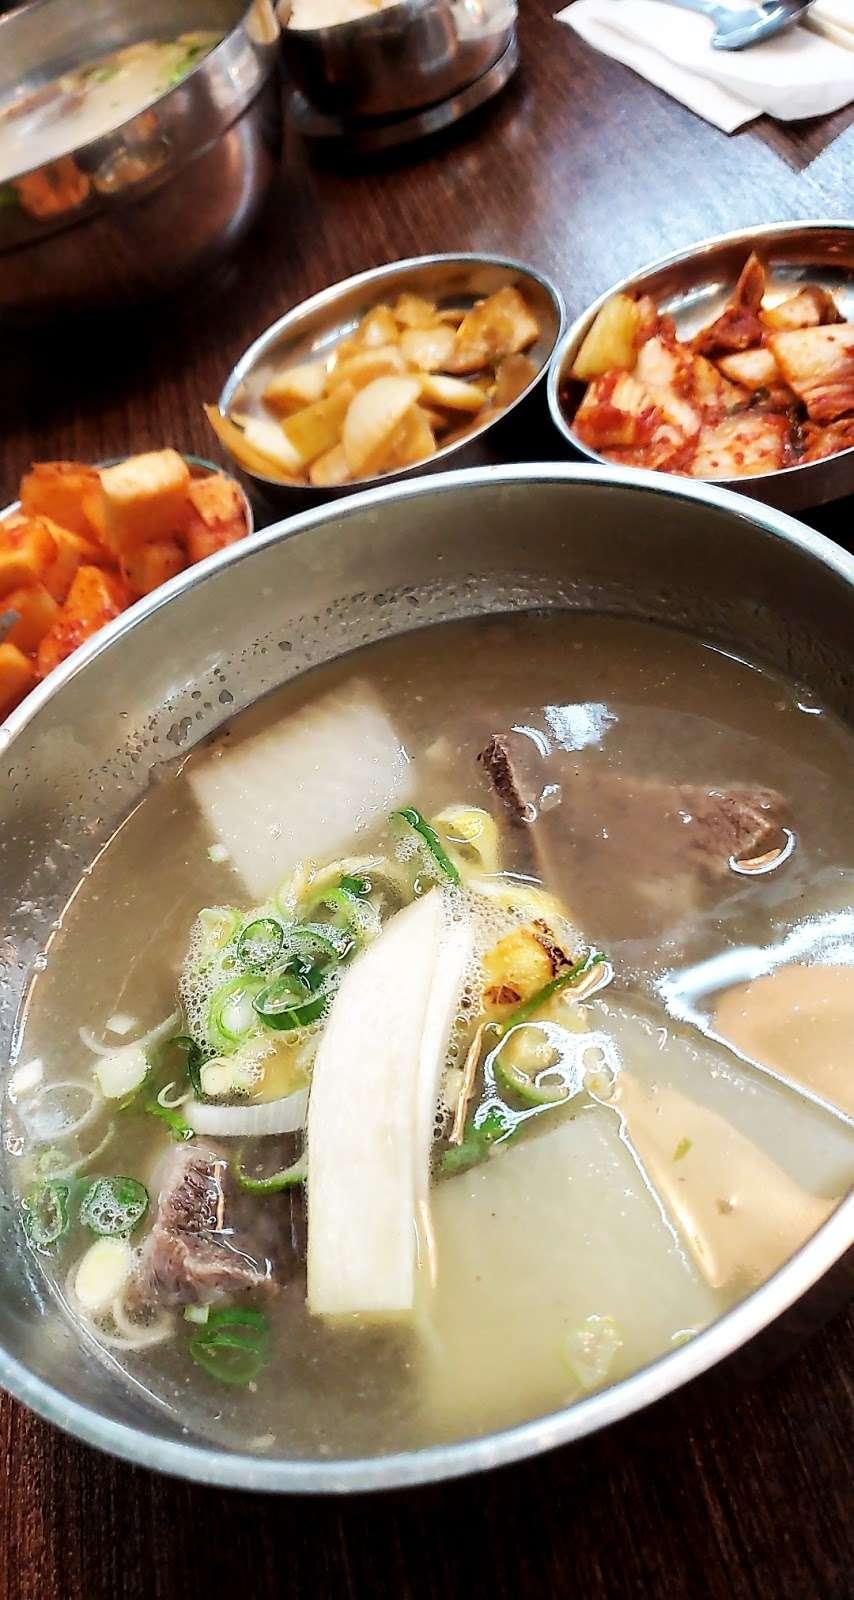 Shinseon seolleontang - restaurant  | Photo 10 of 10 | Address: 2640, 75007 Old Denton Rd #120, Carrollton, TX 75007, USA | Phone: (972) 245-1888